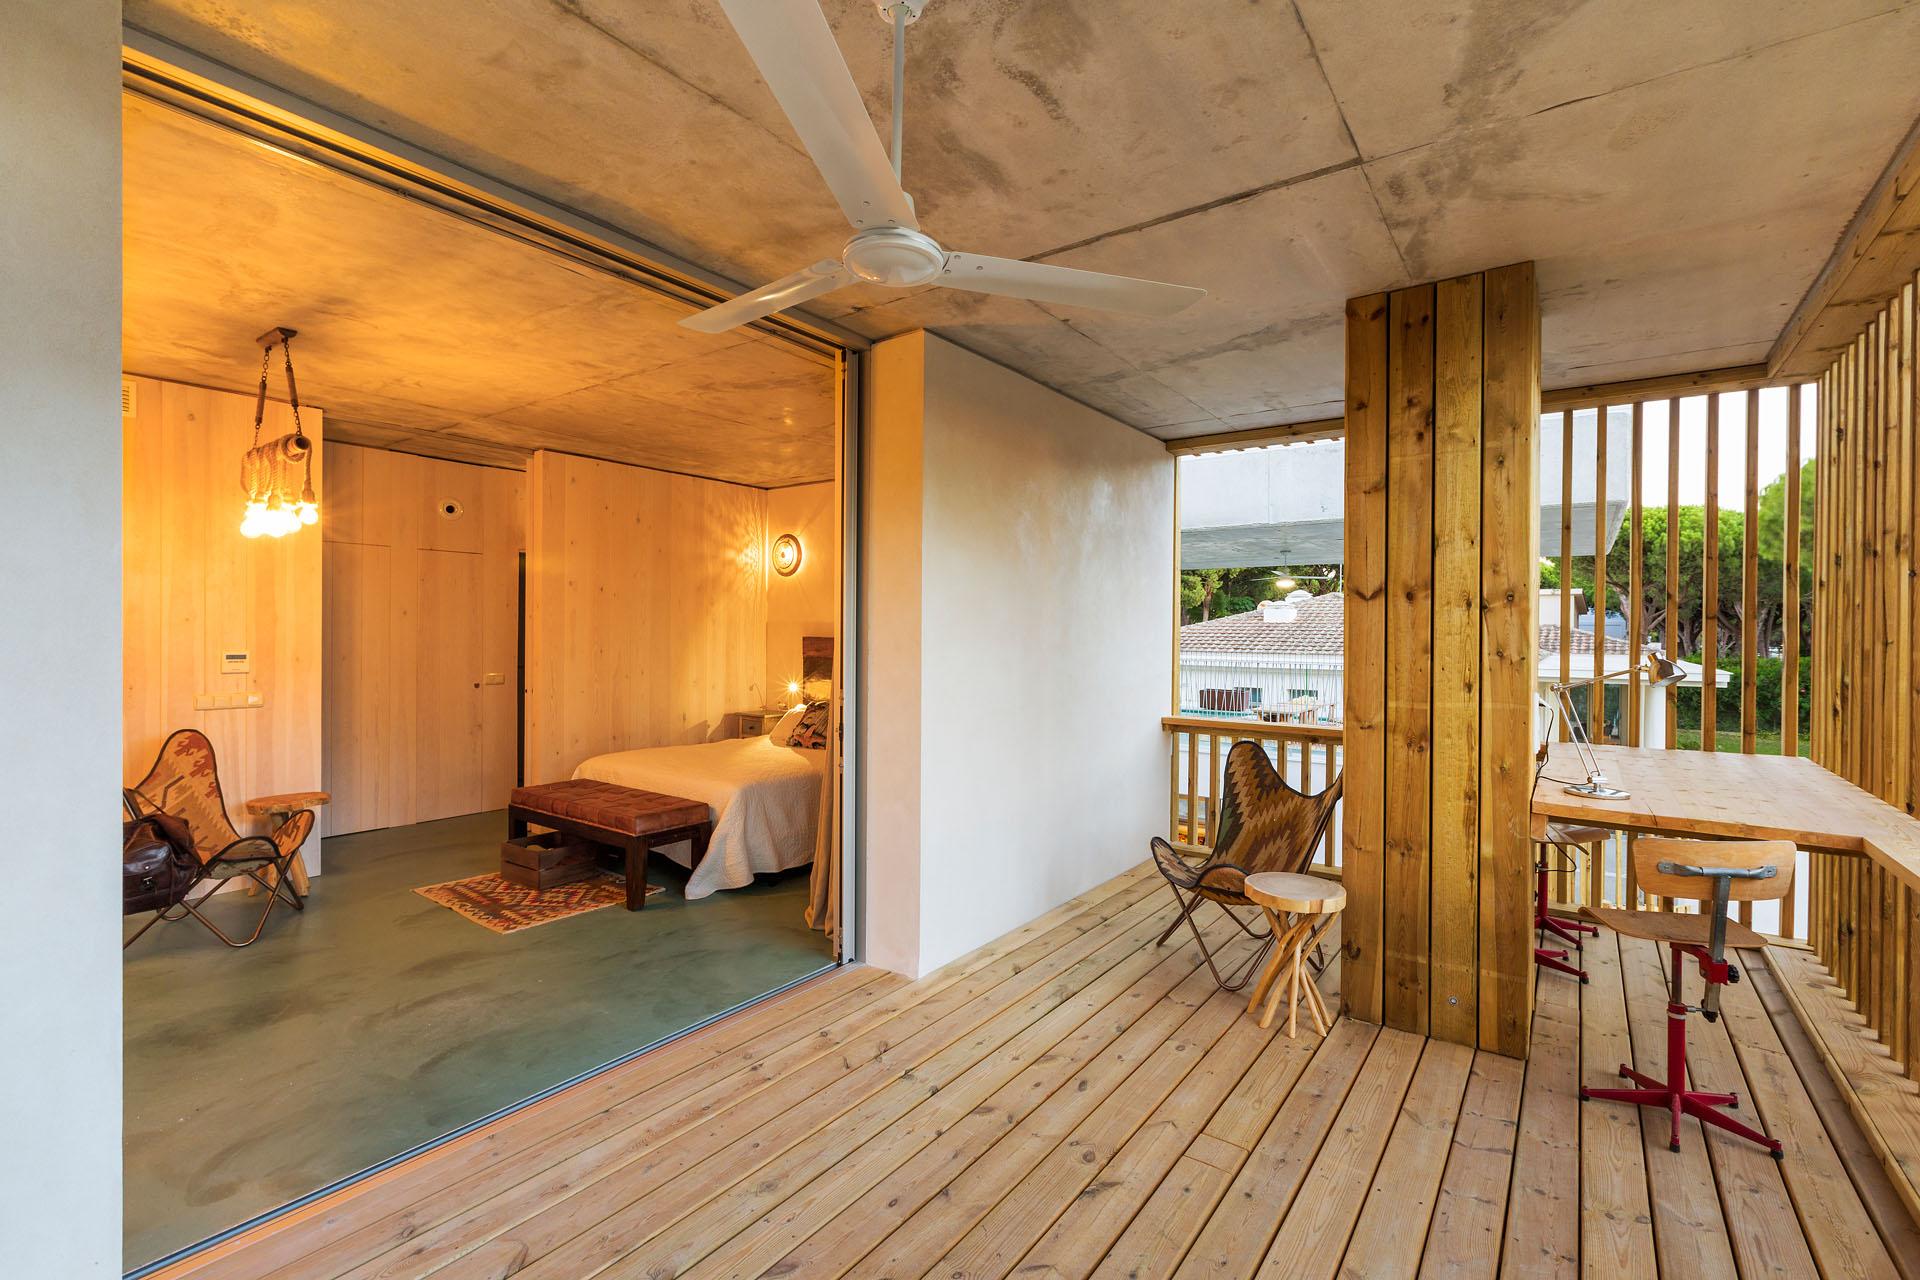 fotografia-de-interiorismo-y-hotelesfotografia-de-interiorismo-y-hoteles